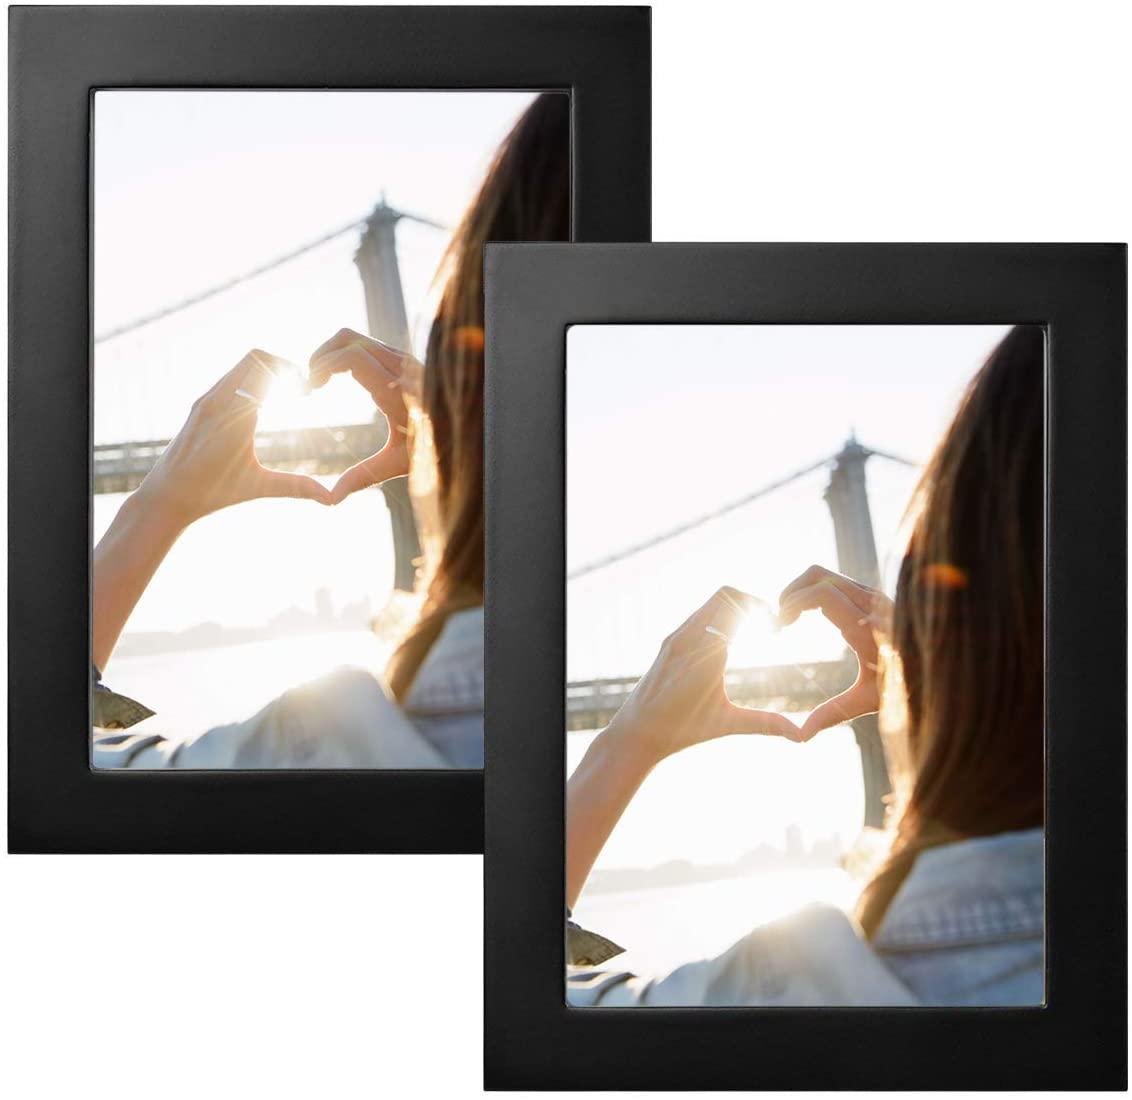 Klinsten 8x10 Picture Frame Elegant and Nice Design Black Wood 8x10 Photo Display Photo Frame for Desk or Wall 2 Pack